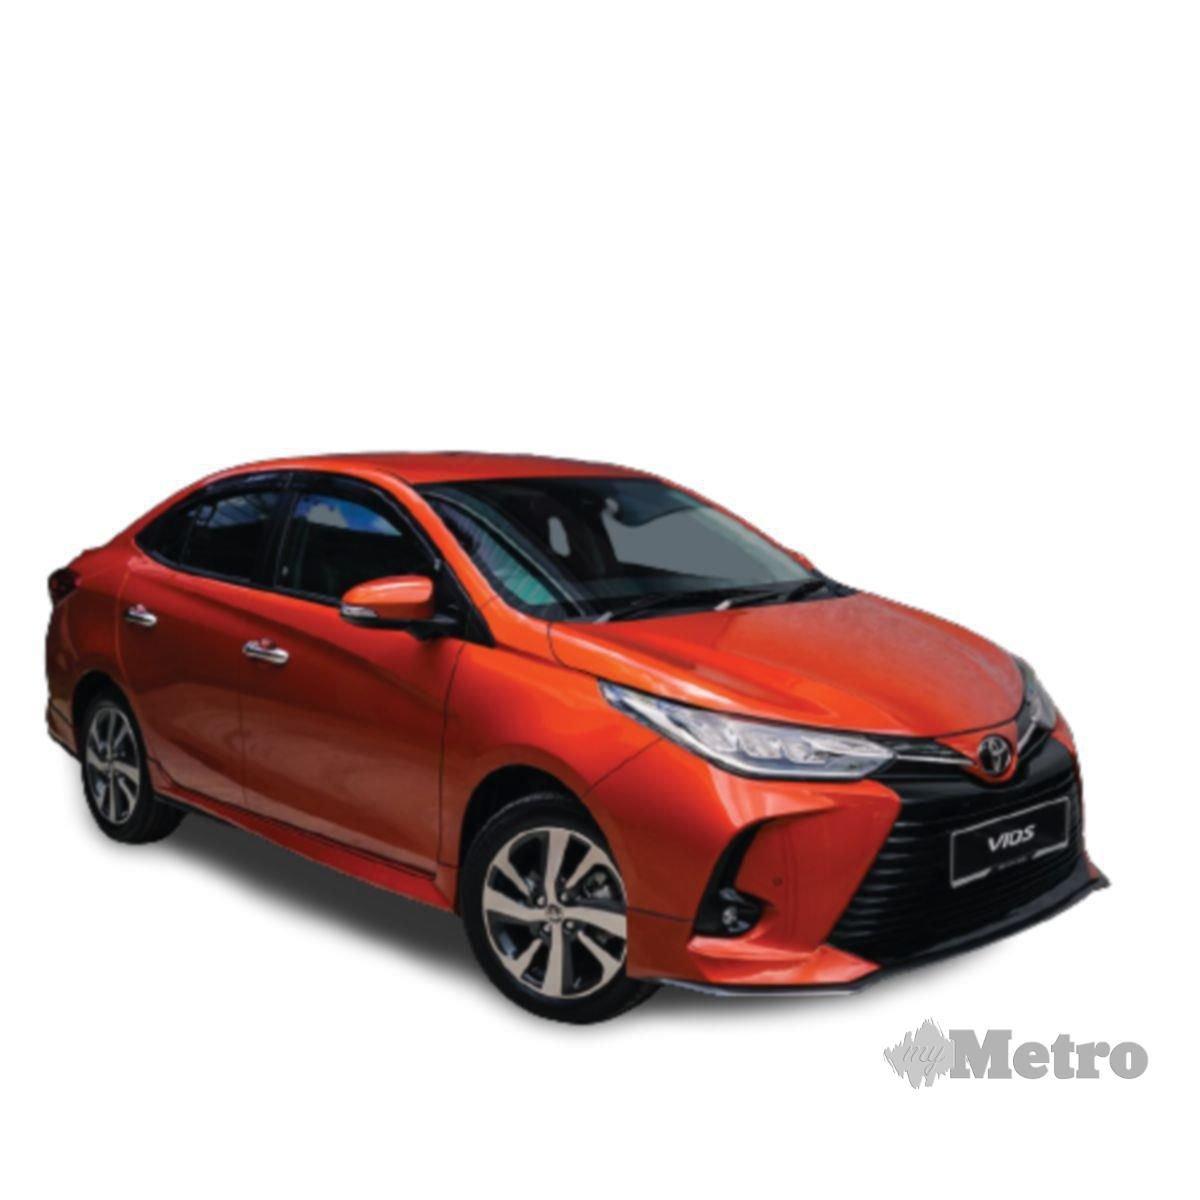 TOYOTA Vios antara model kereta  ditawarkan dalam program Kinto One.